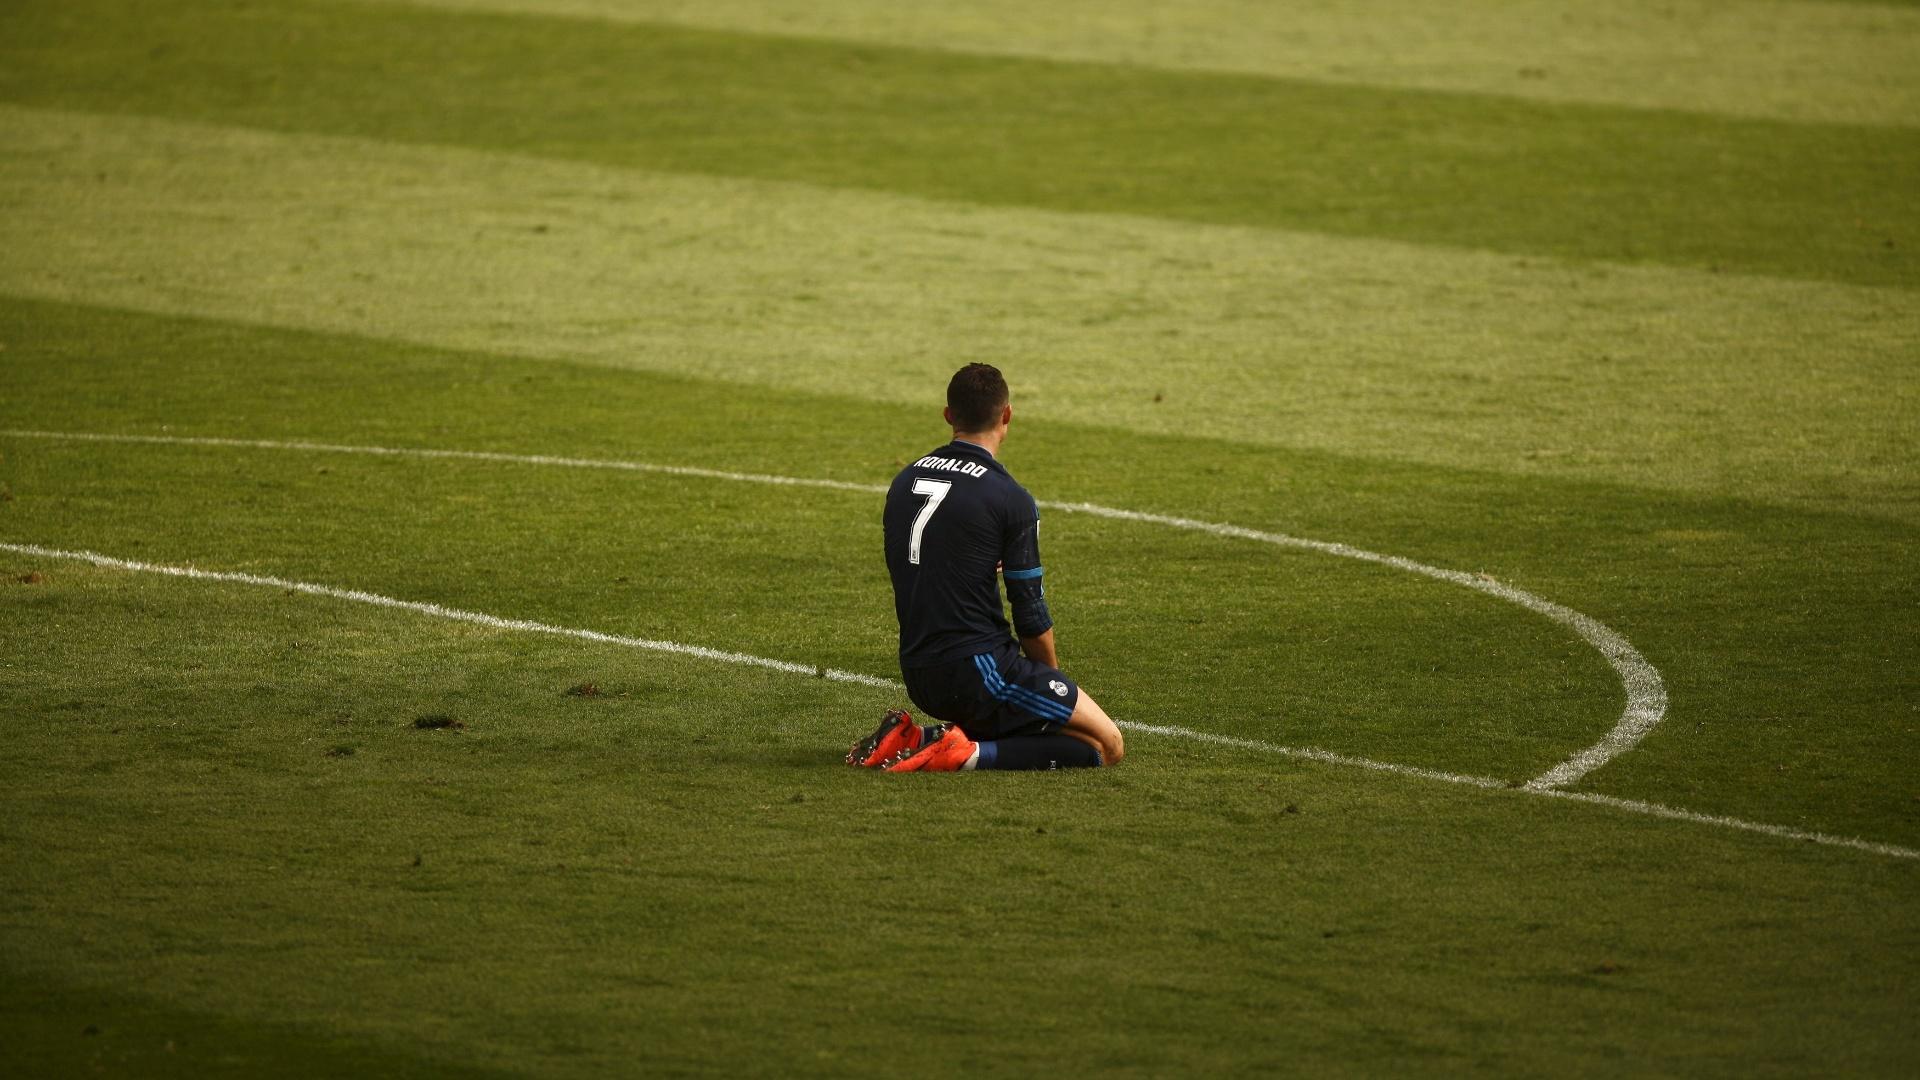 Cristiano Ronaldo lamenta pênalti perdido diante do Málaga. Kameni defendeu